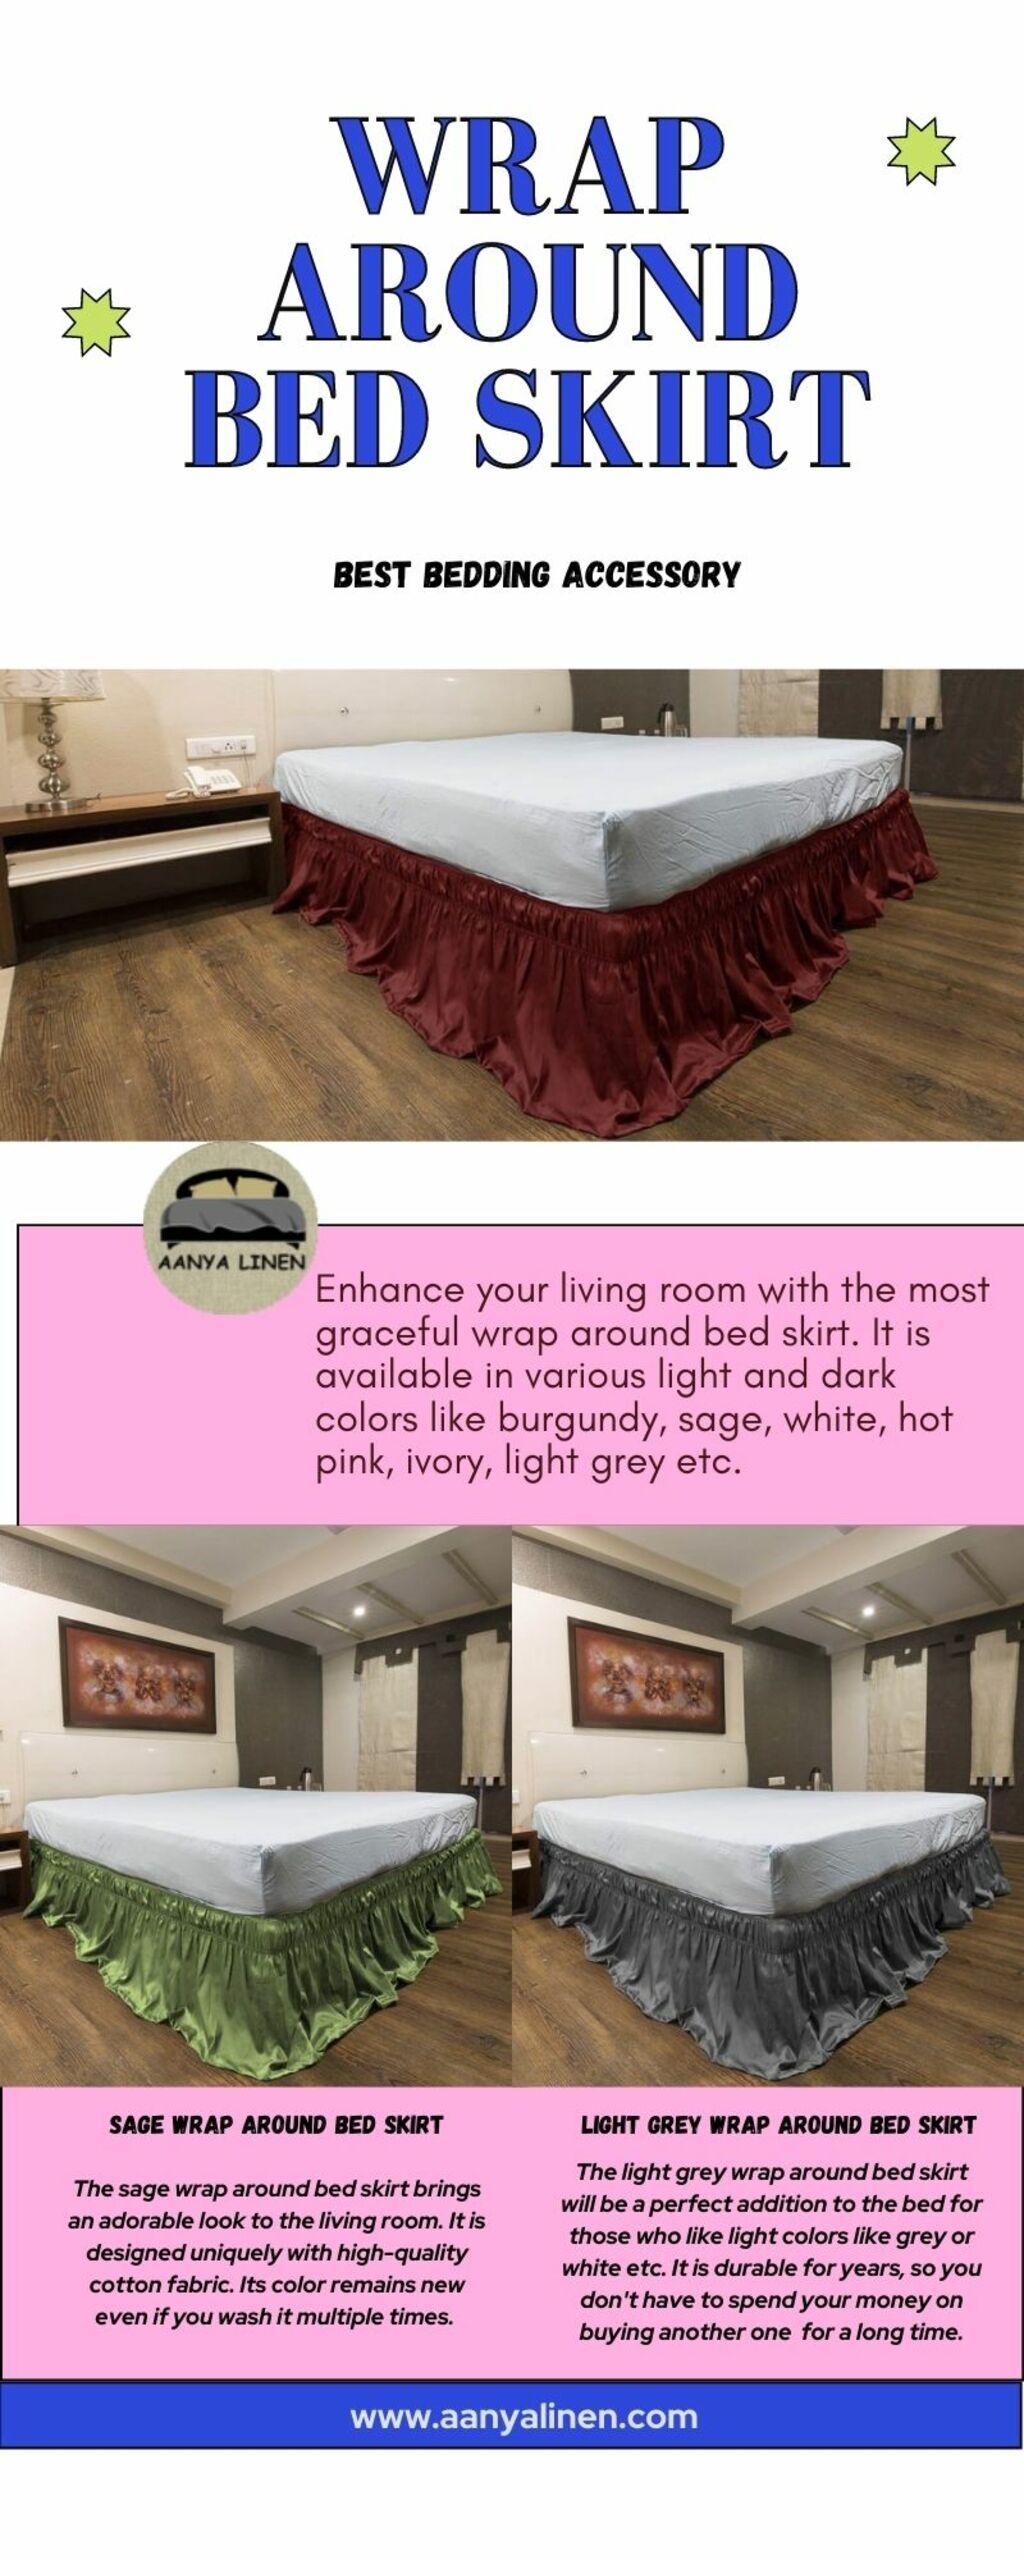 Wrap Around Bed Skirt via louren roy